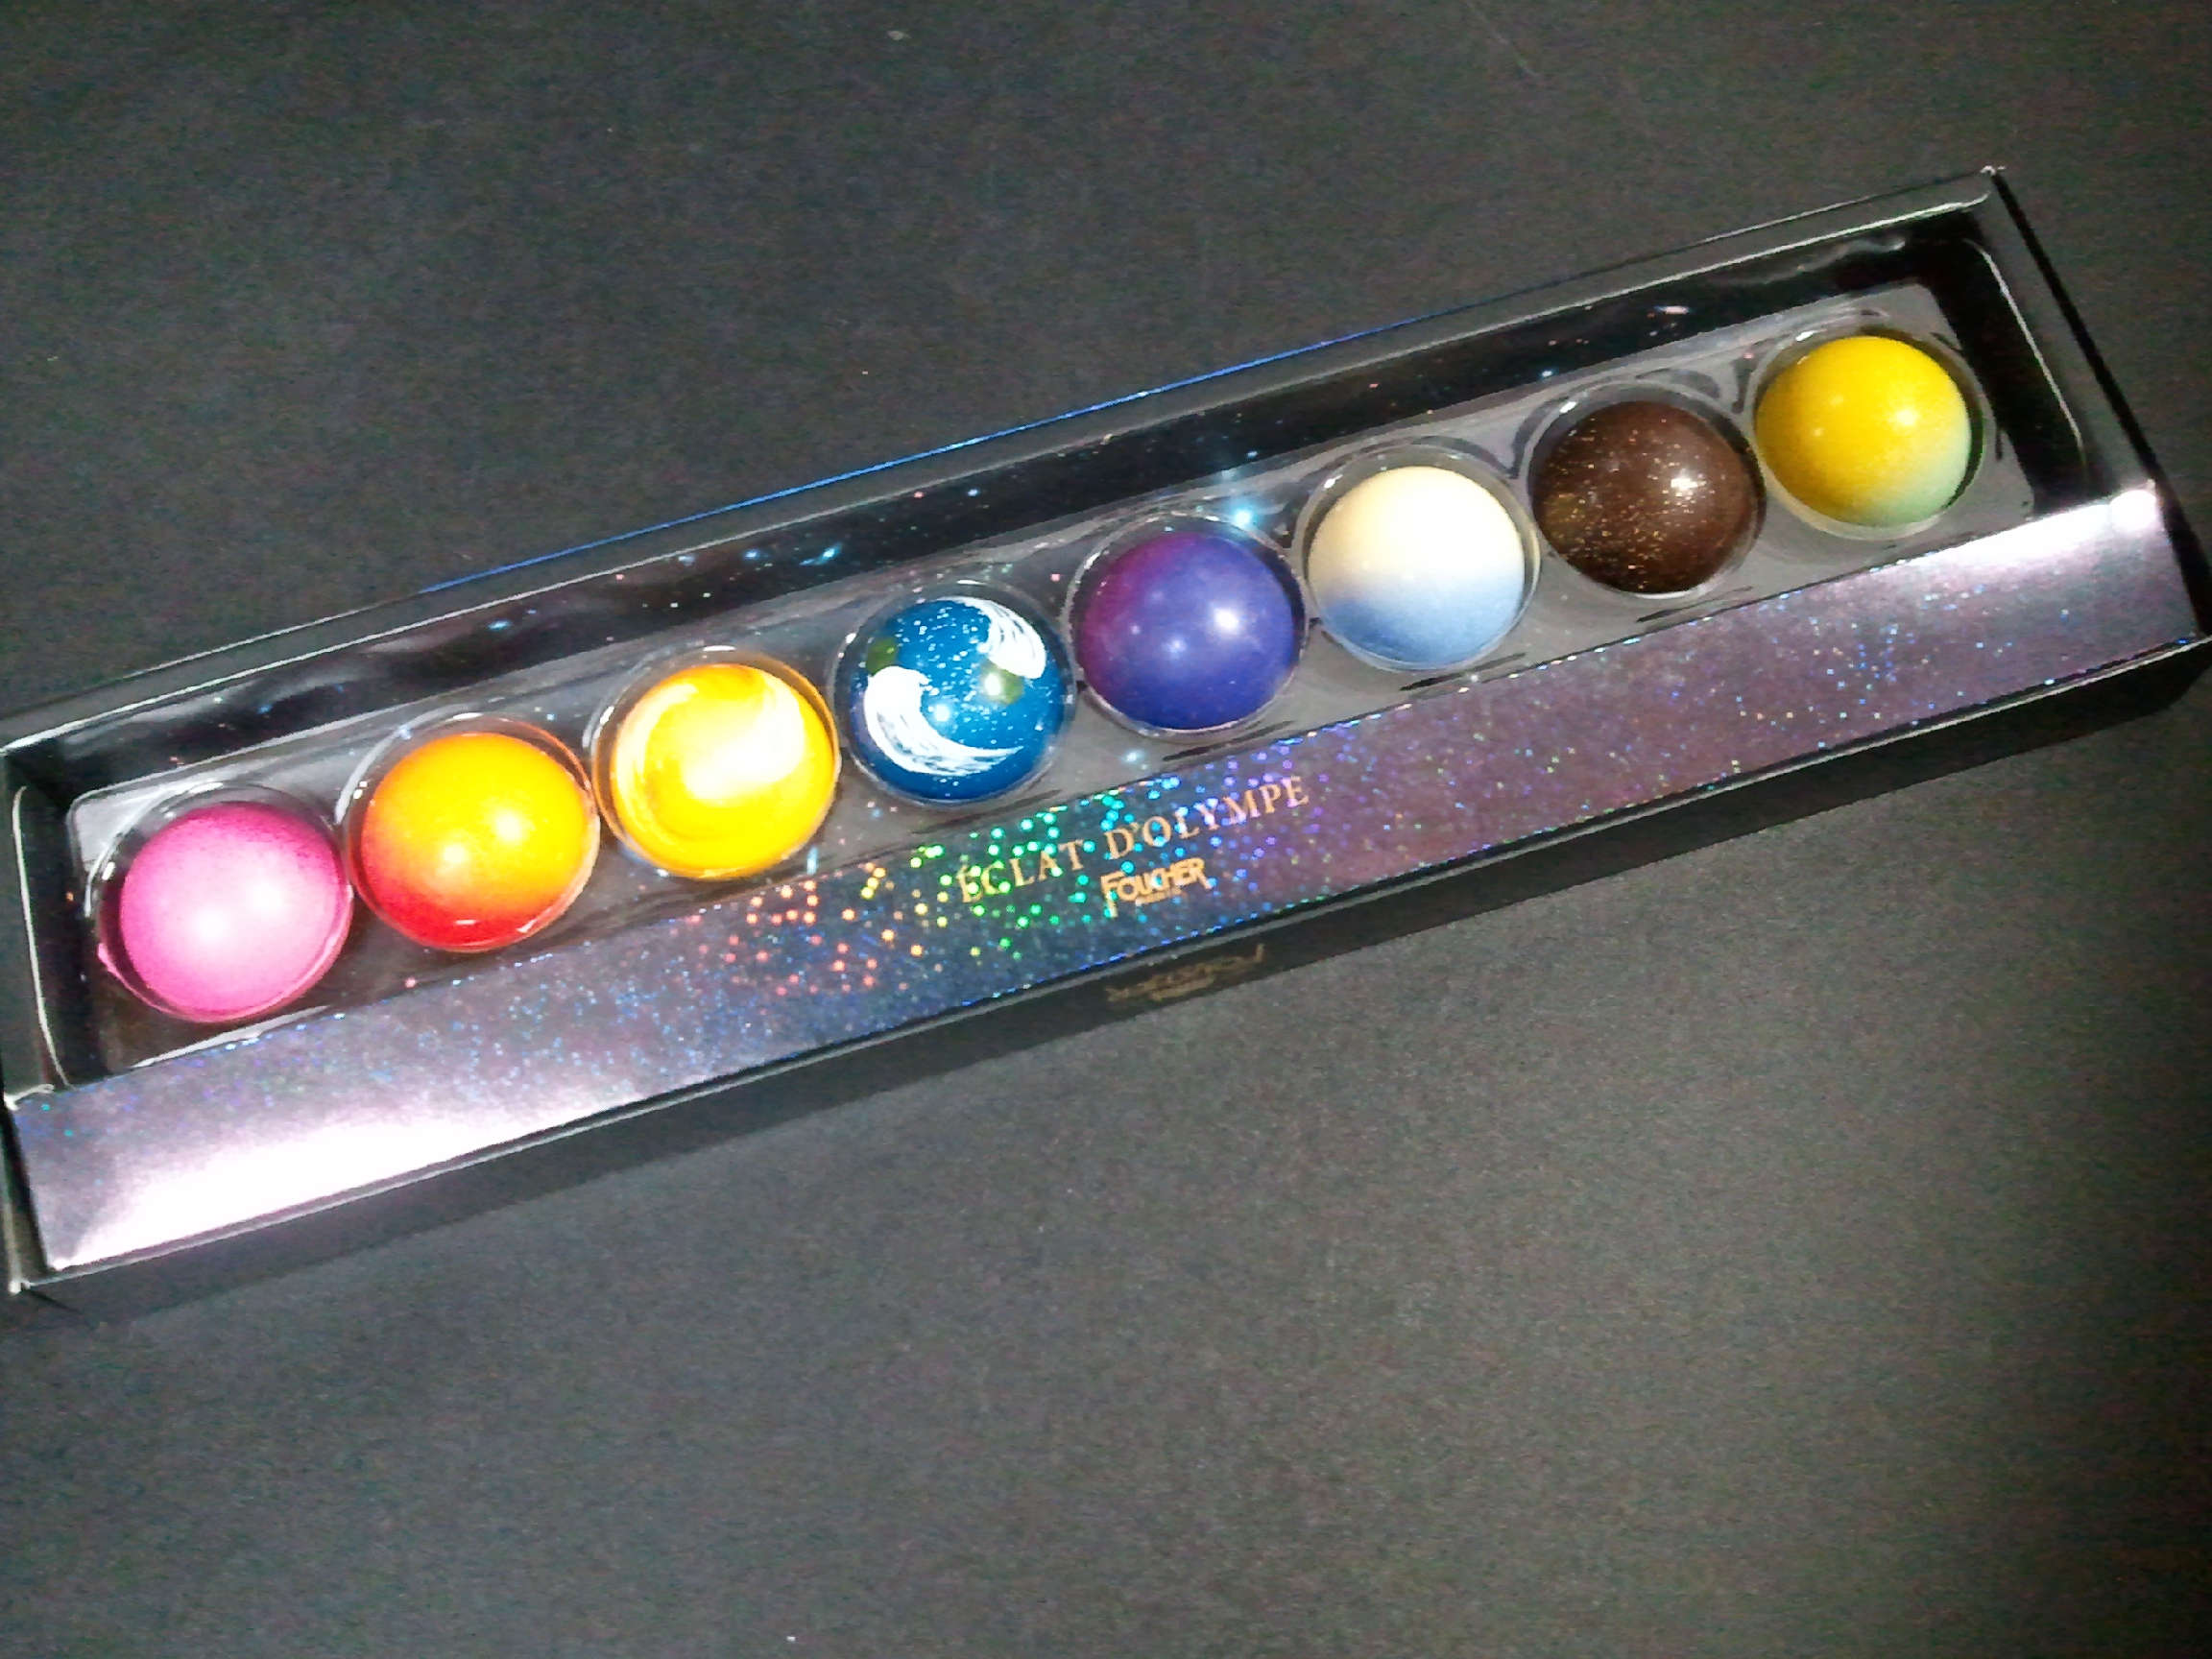 FOUCHER OLYMPUS 惑星チョコ 2